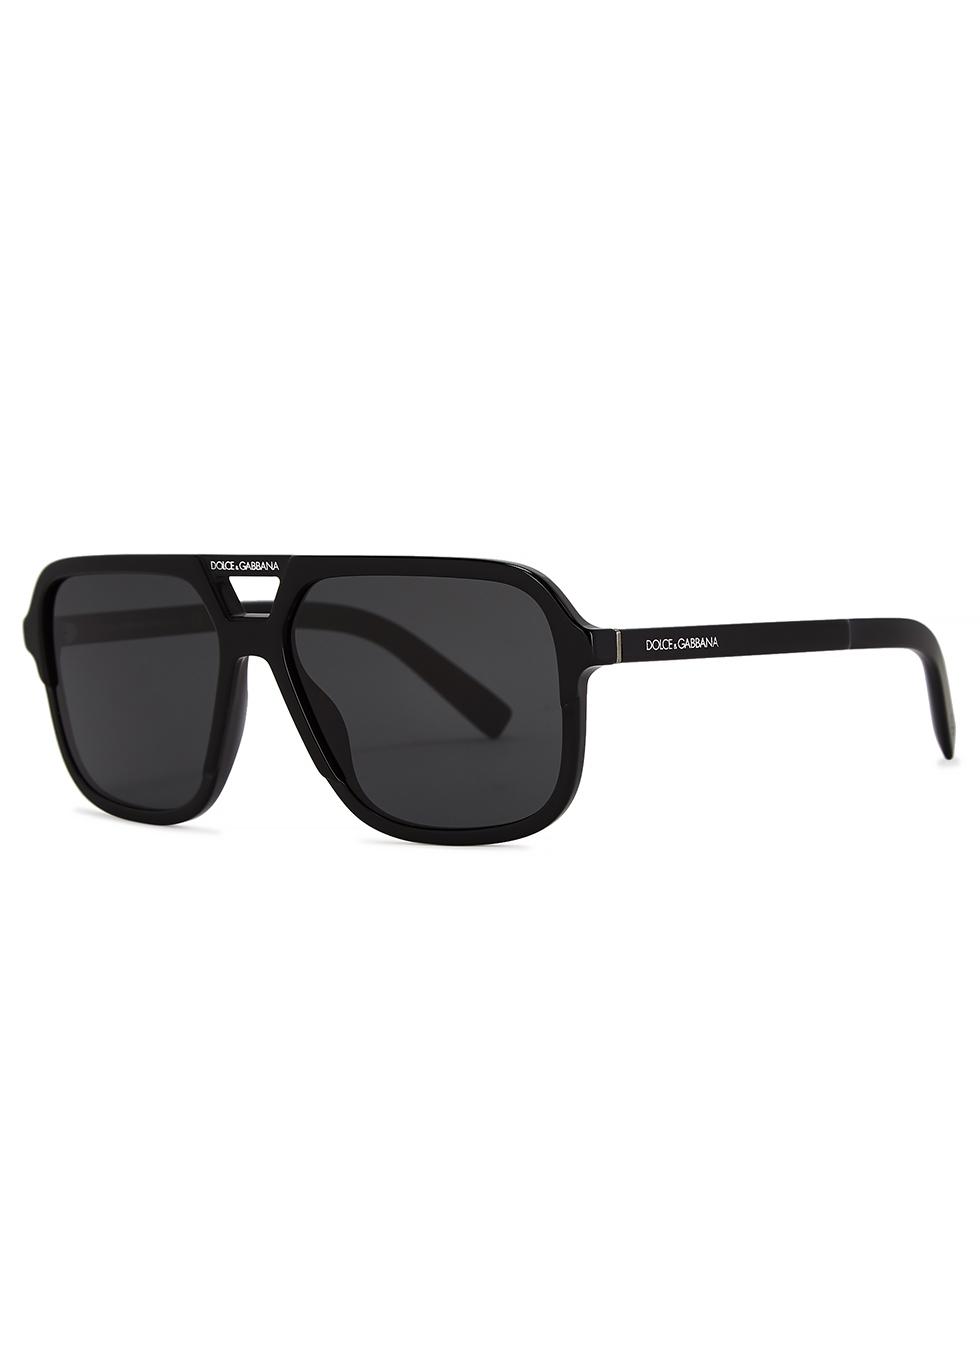 6251261650b7 Men s Designer Sunglasses   Eyewear - Harvey Nichols